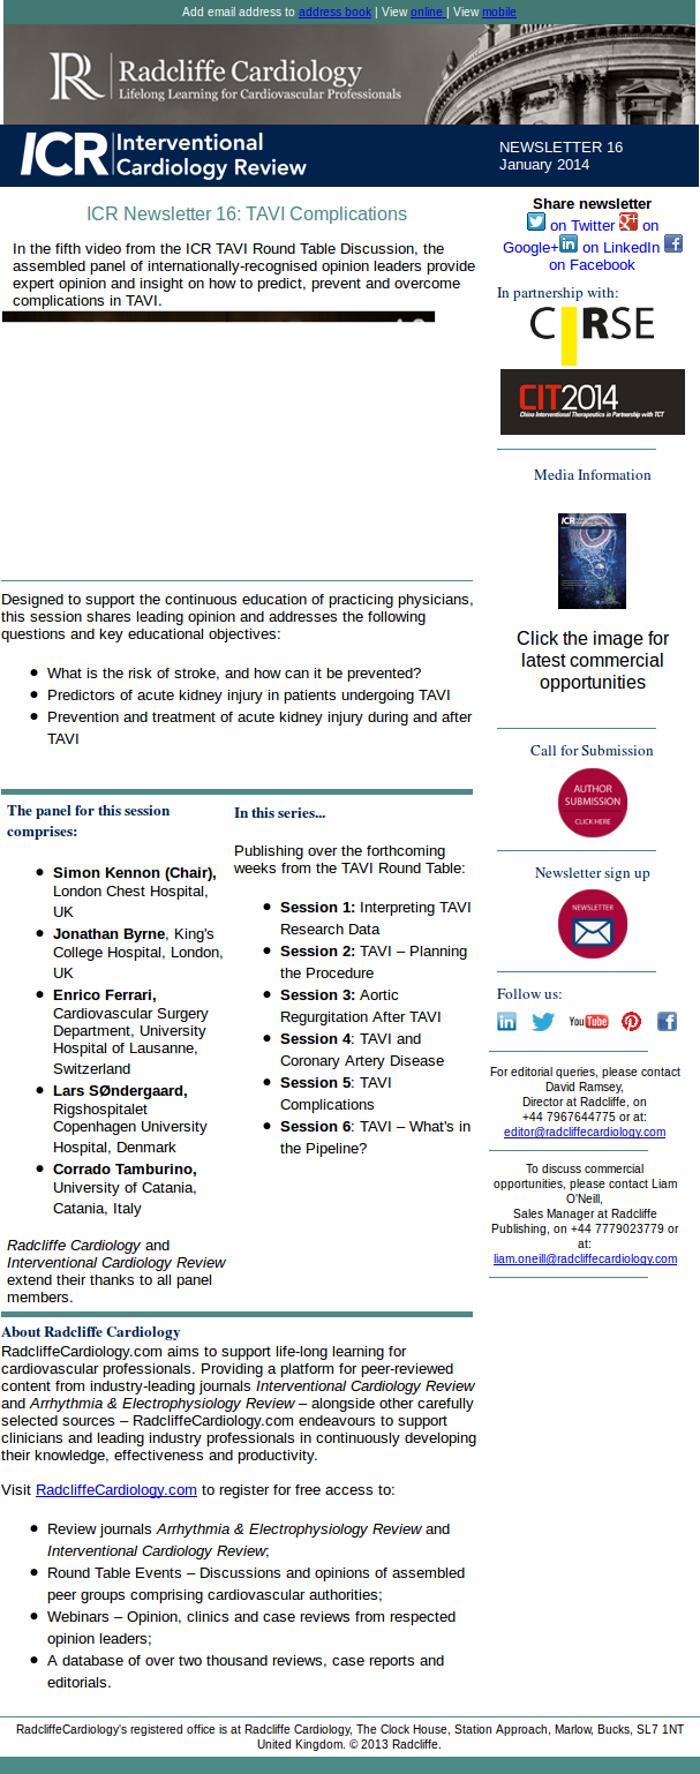 ICR Newsletter 16: TAVI Complications | RadcliffeCardiology